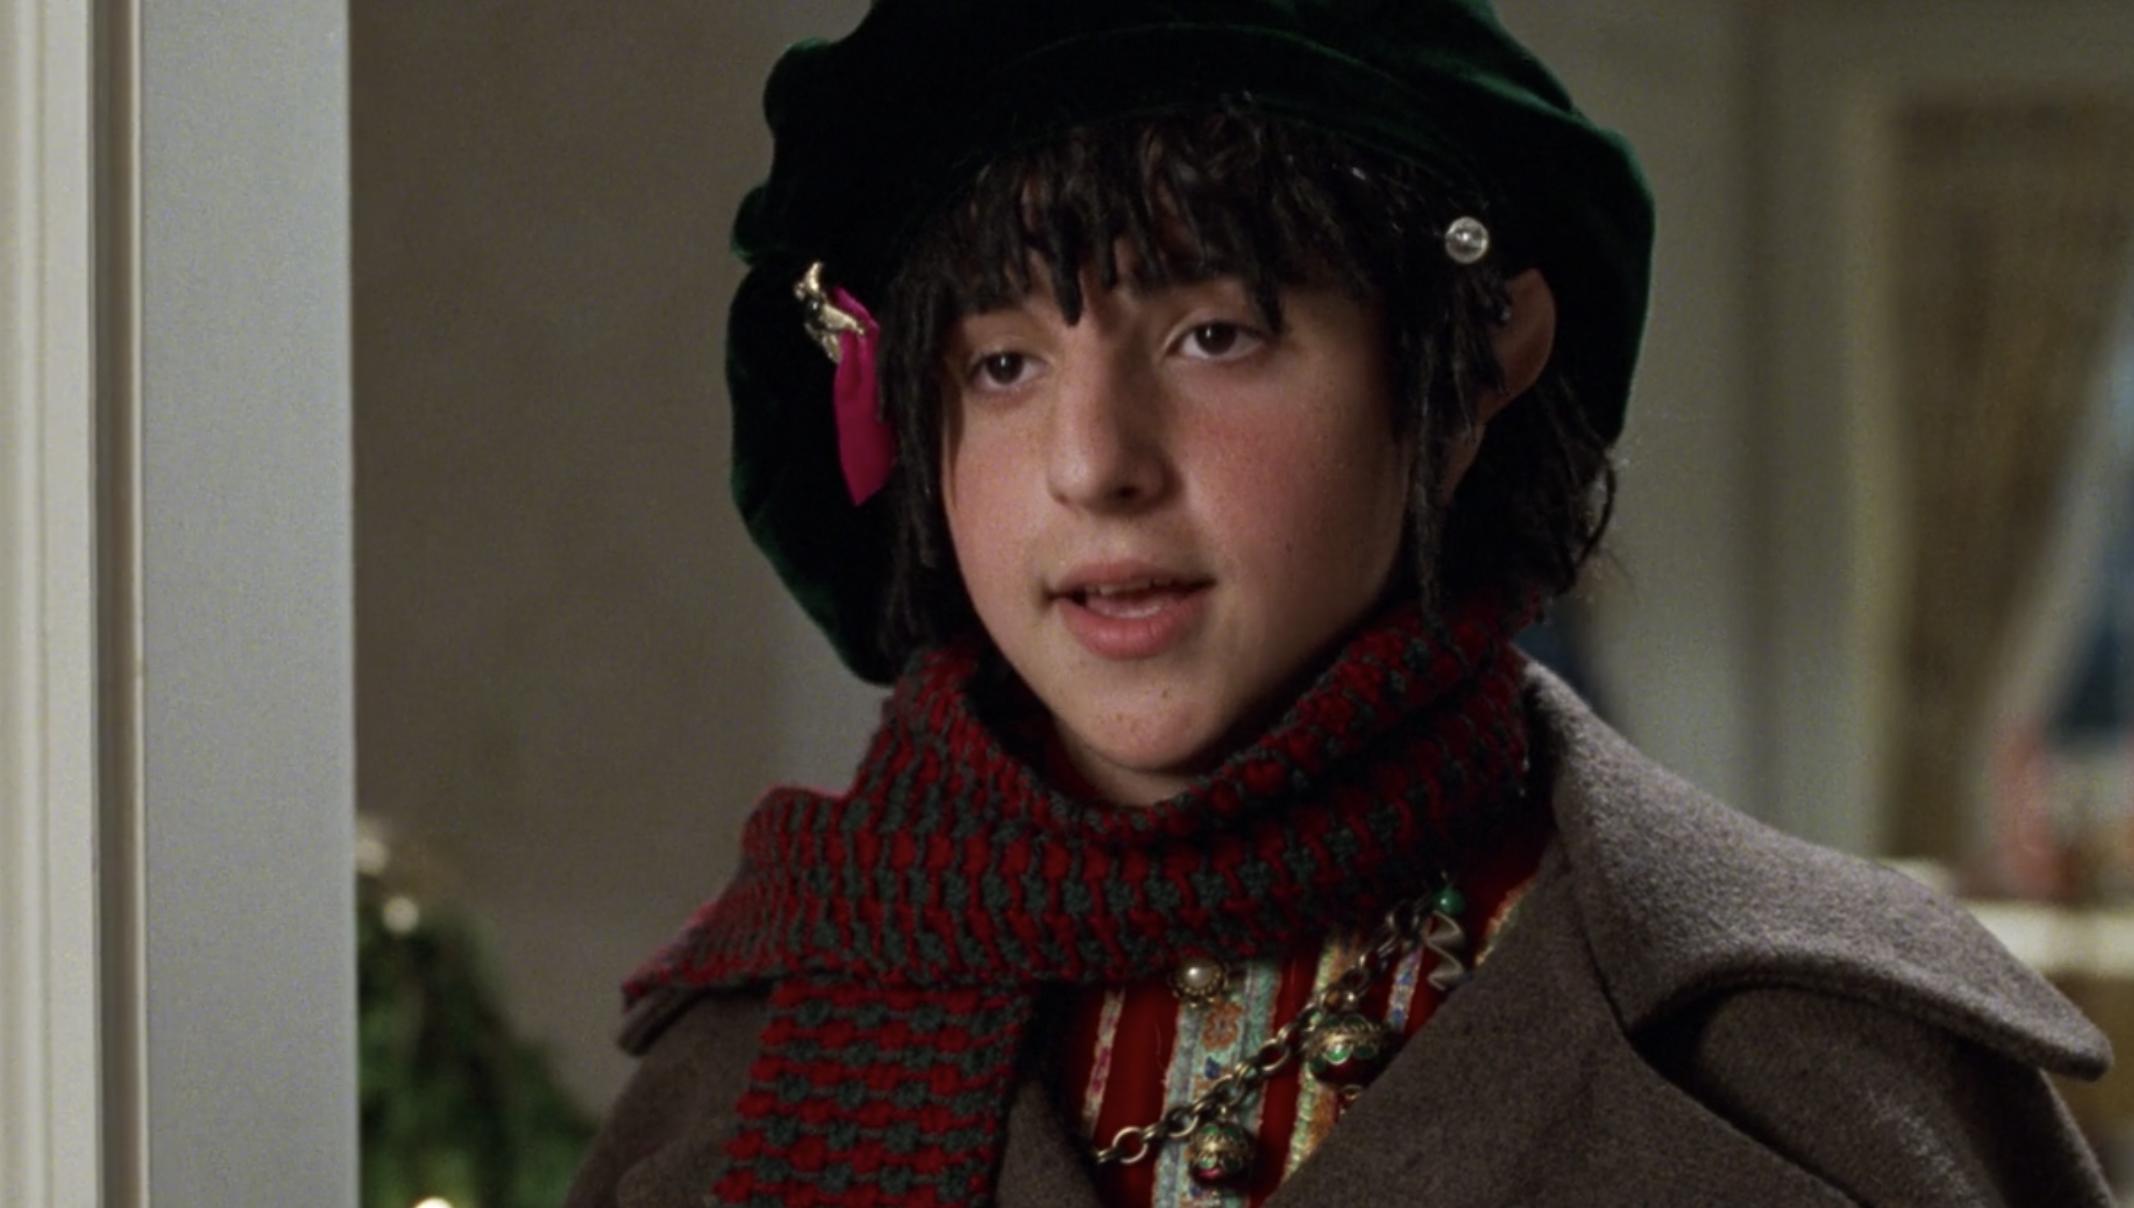 Bernard the elf in Scott's house